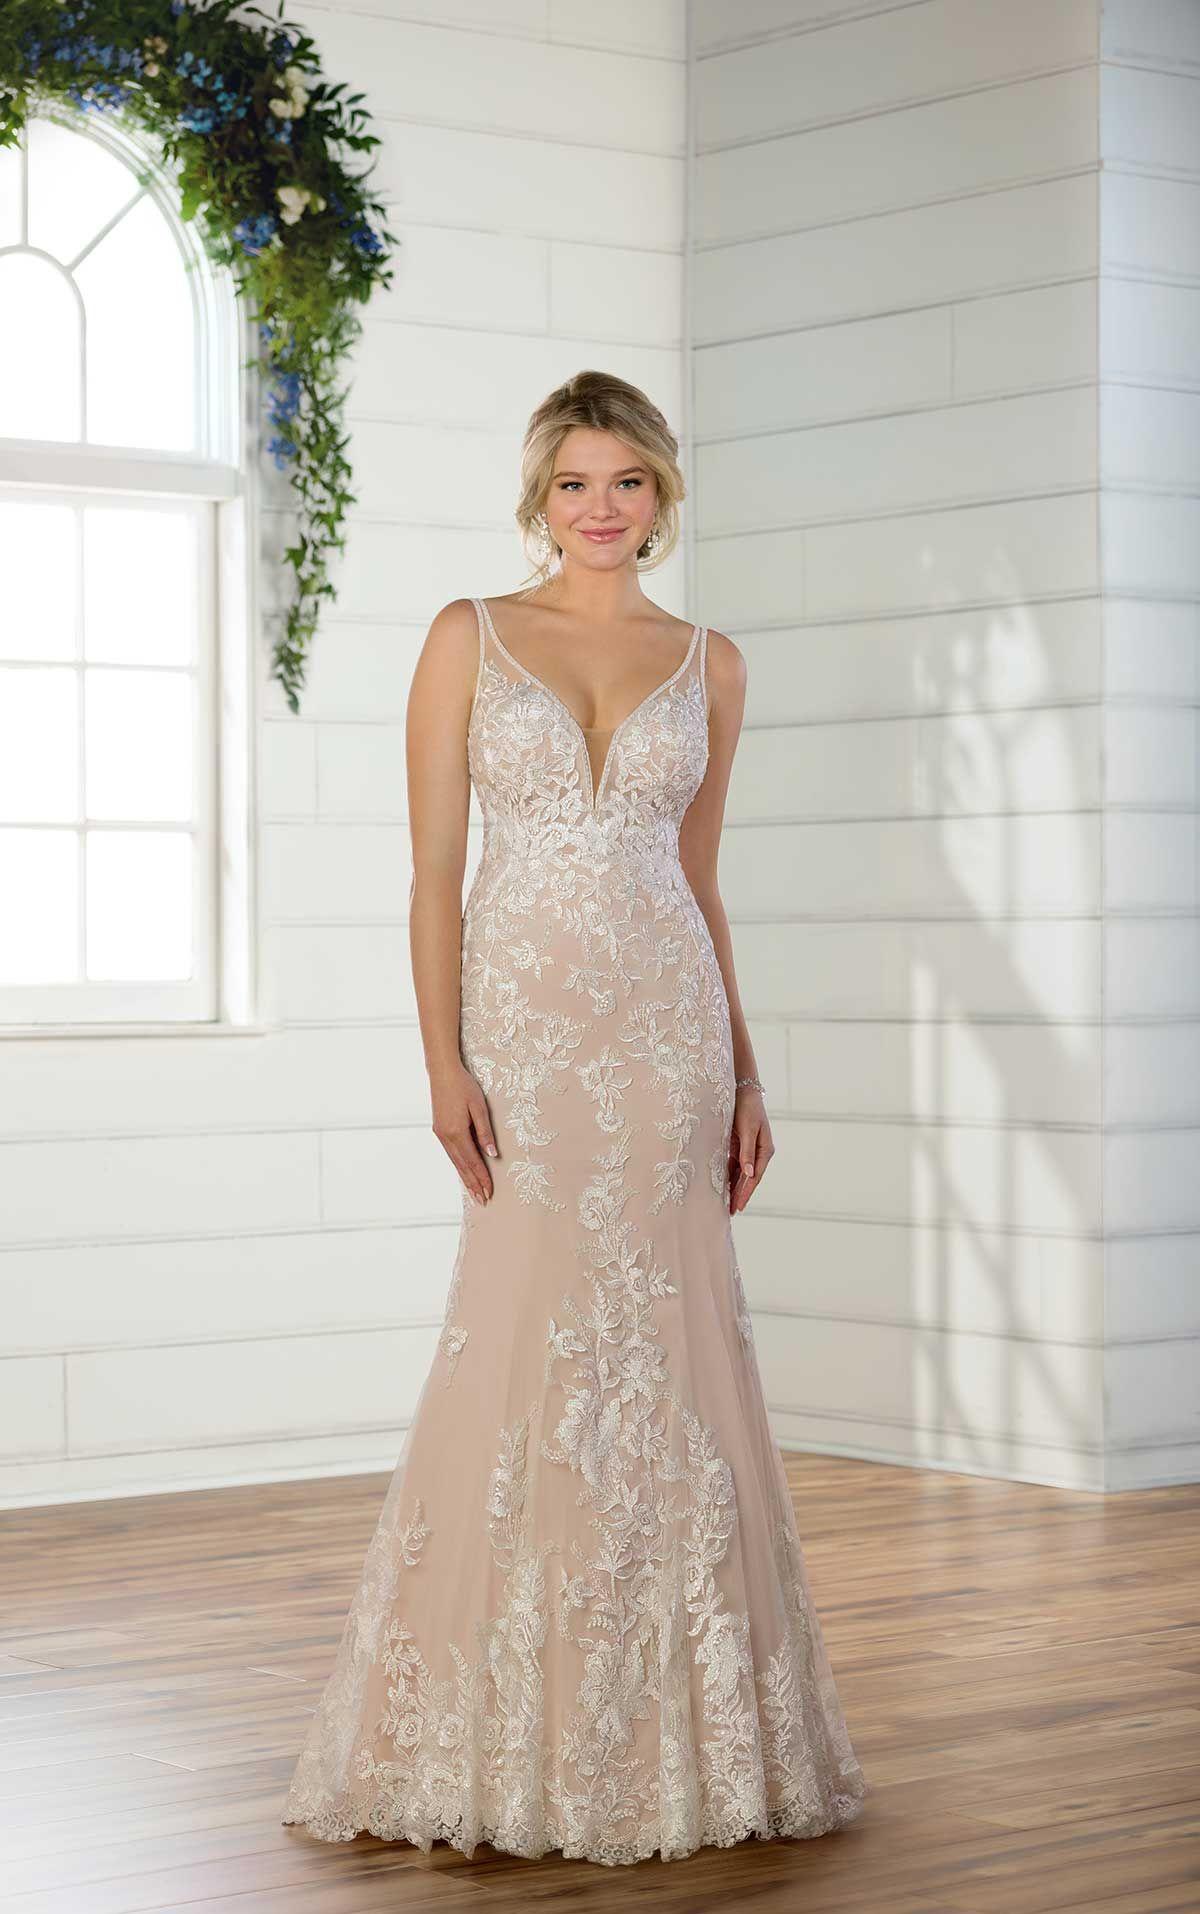 Dreamy chic essense of australia wedding dresses fall